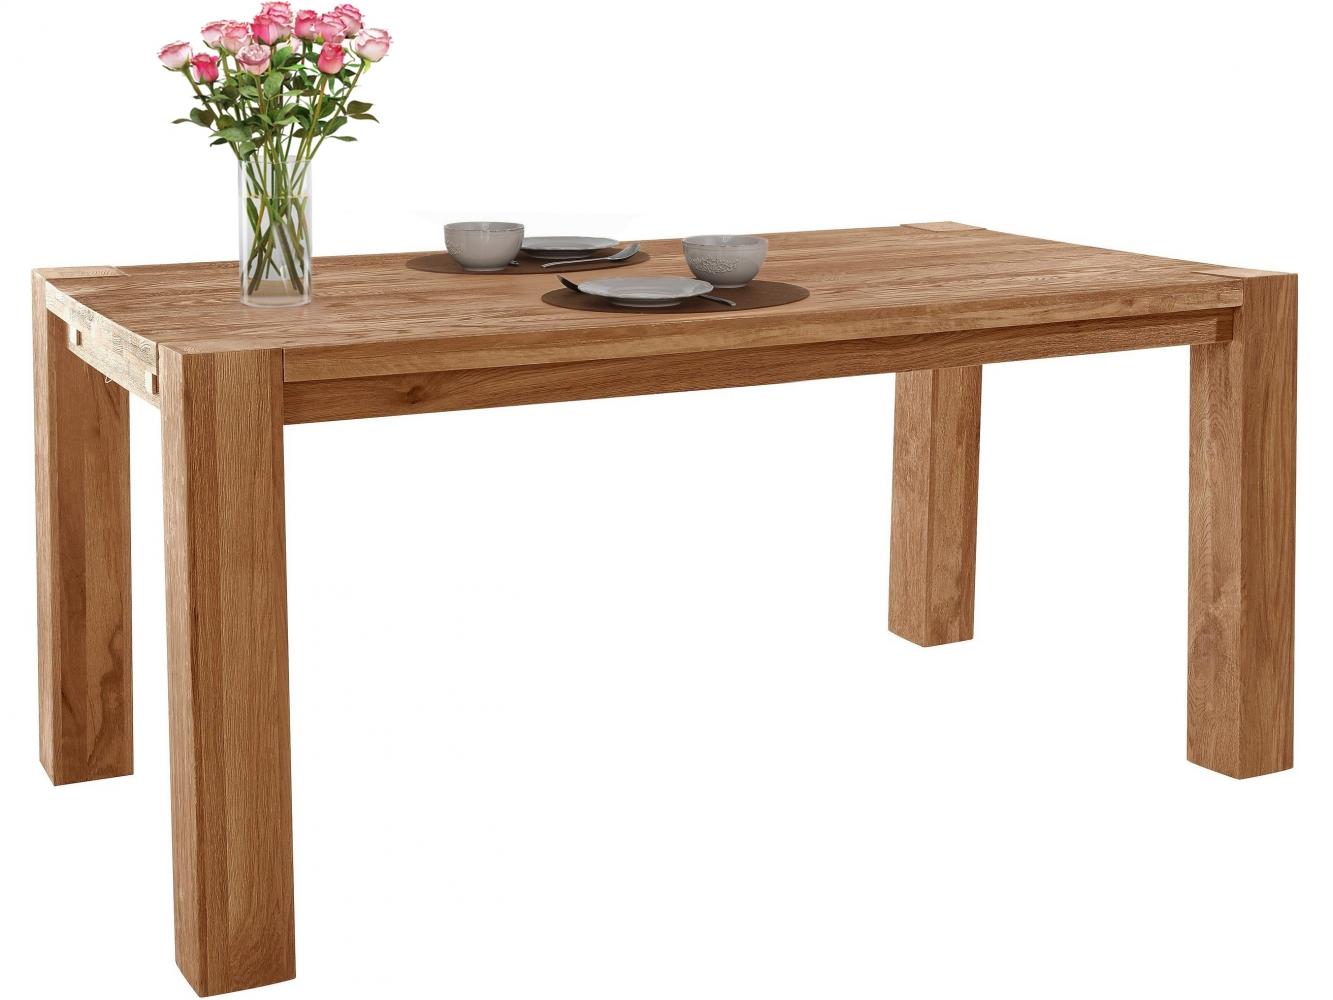 Jídelní stůl Sibera, 180 cm, dub